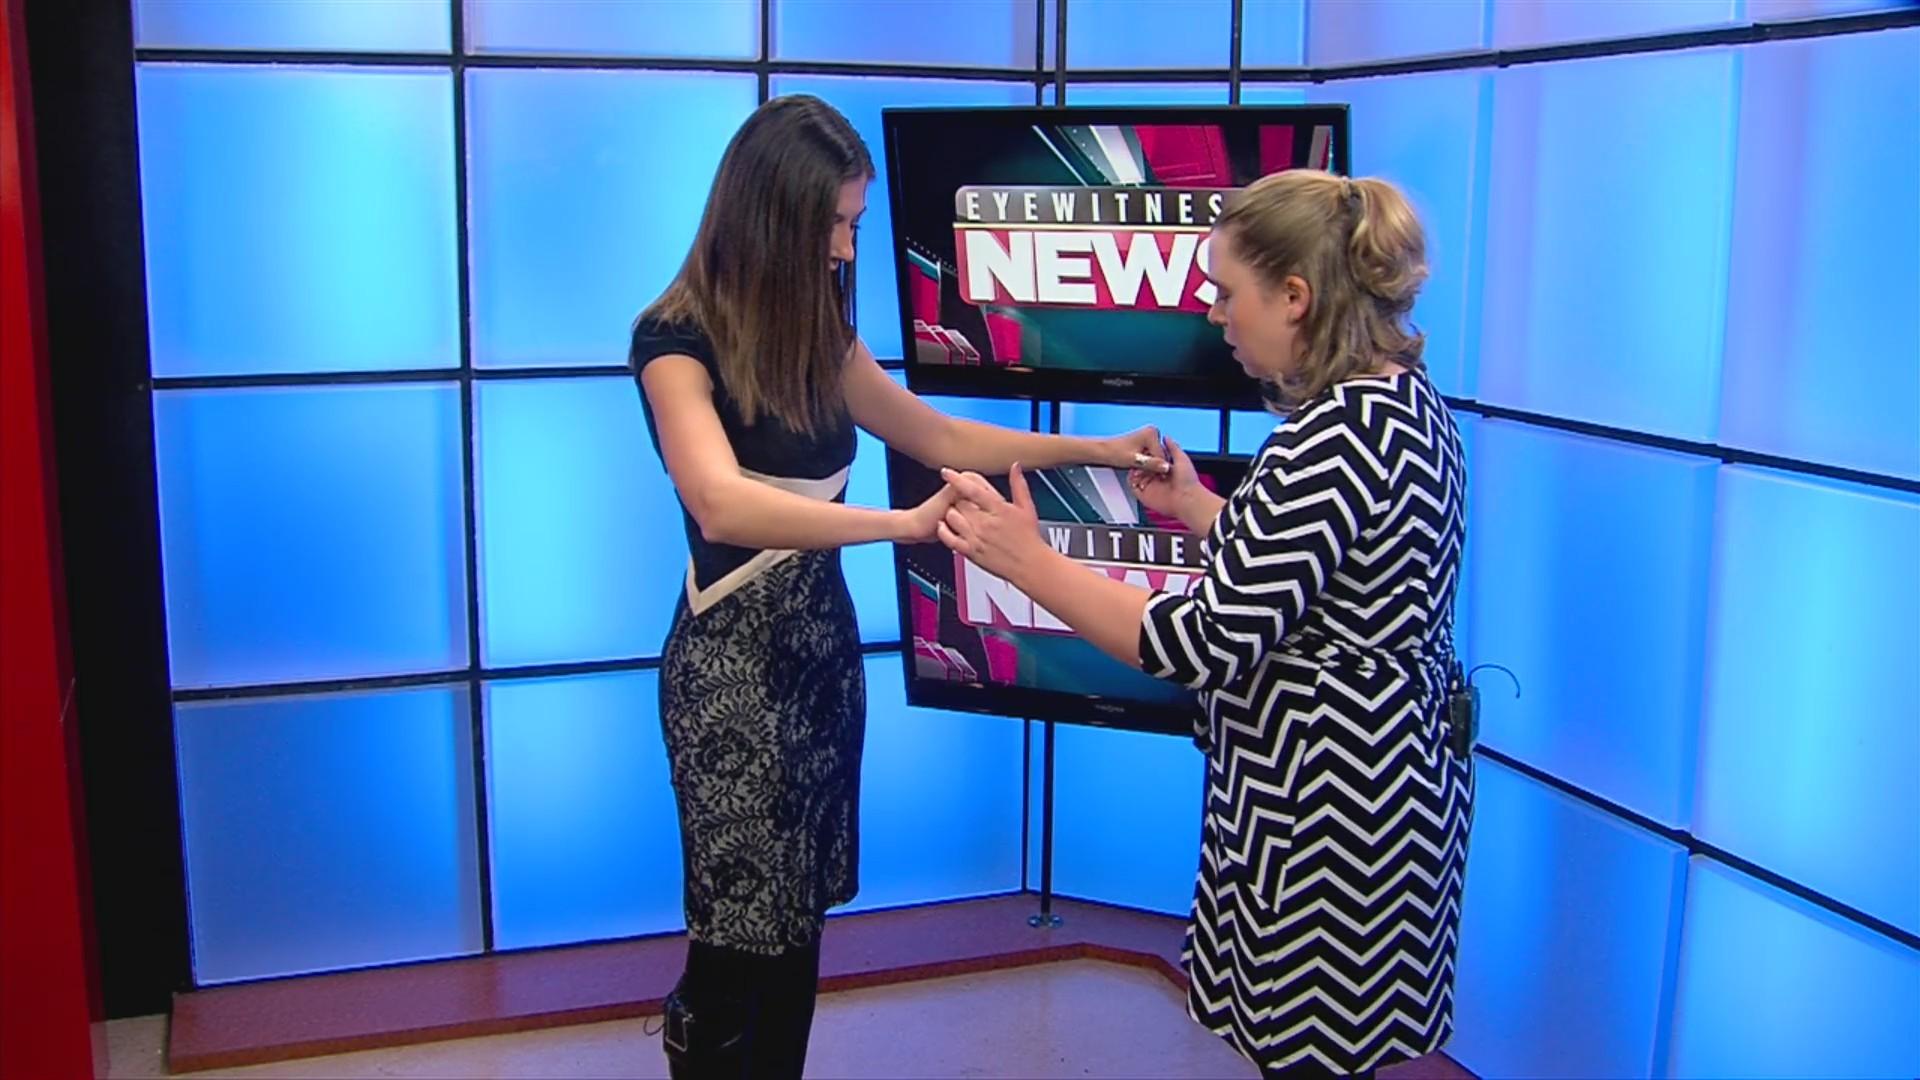 Kathleen Cohen makes her Dancing with Eyewitness News debut